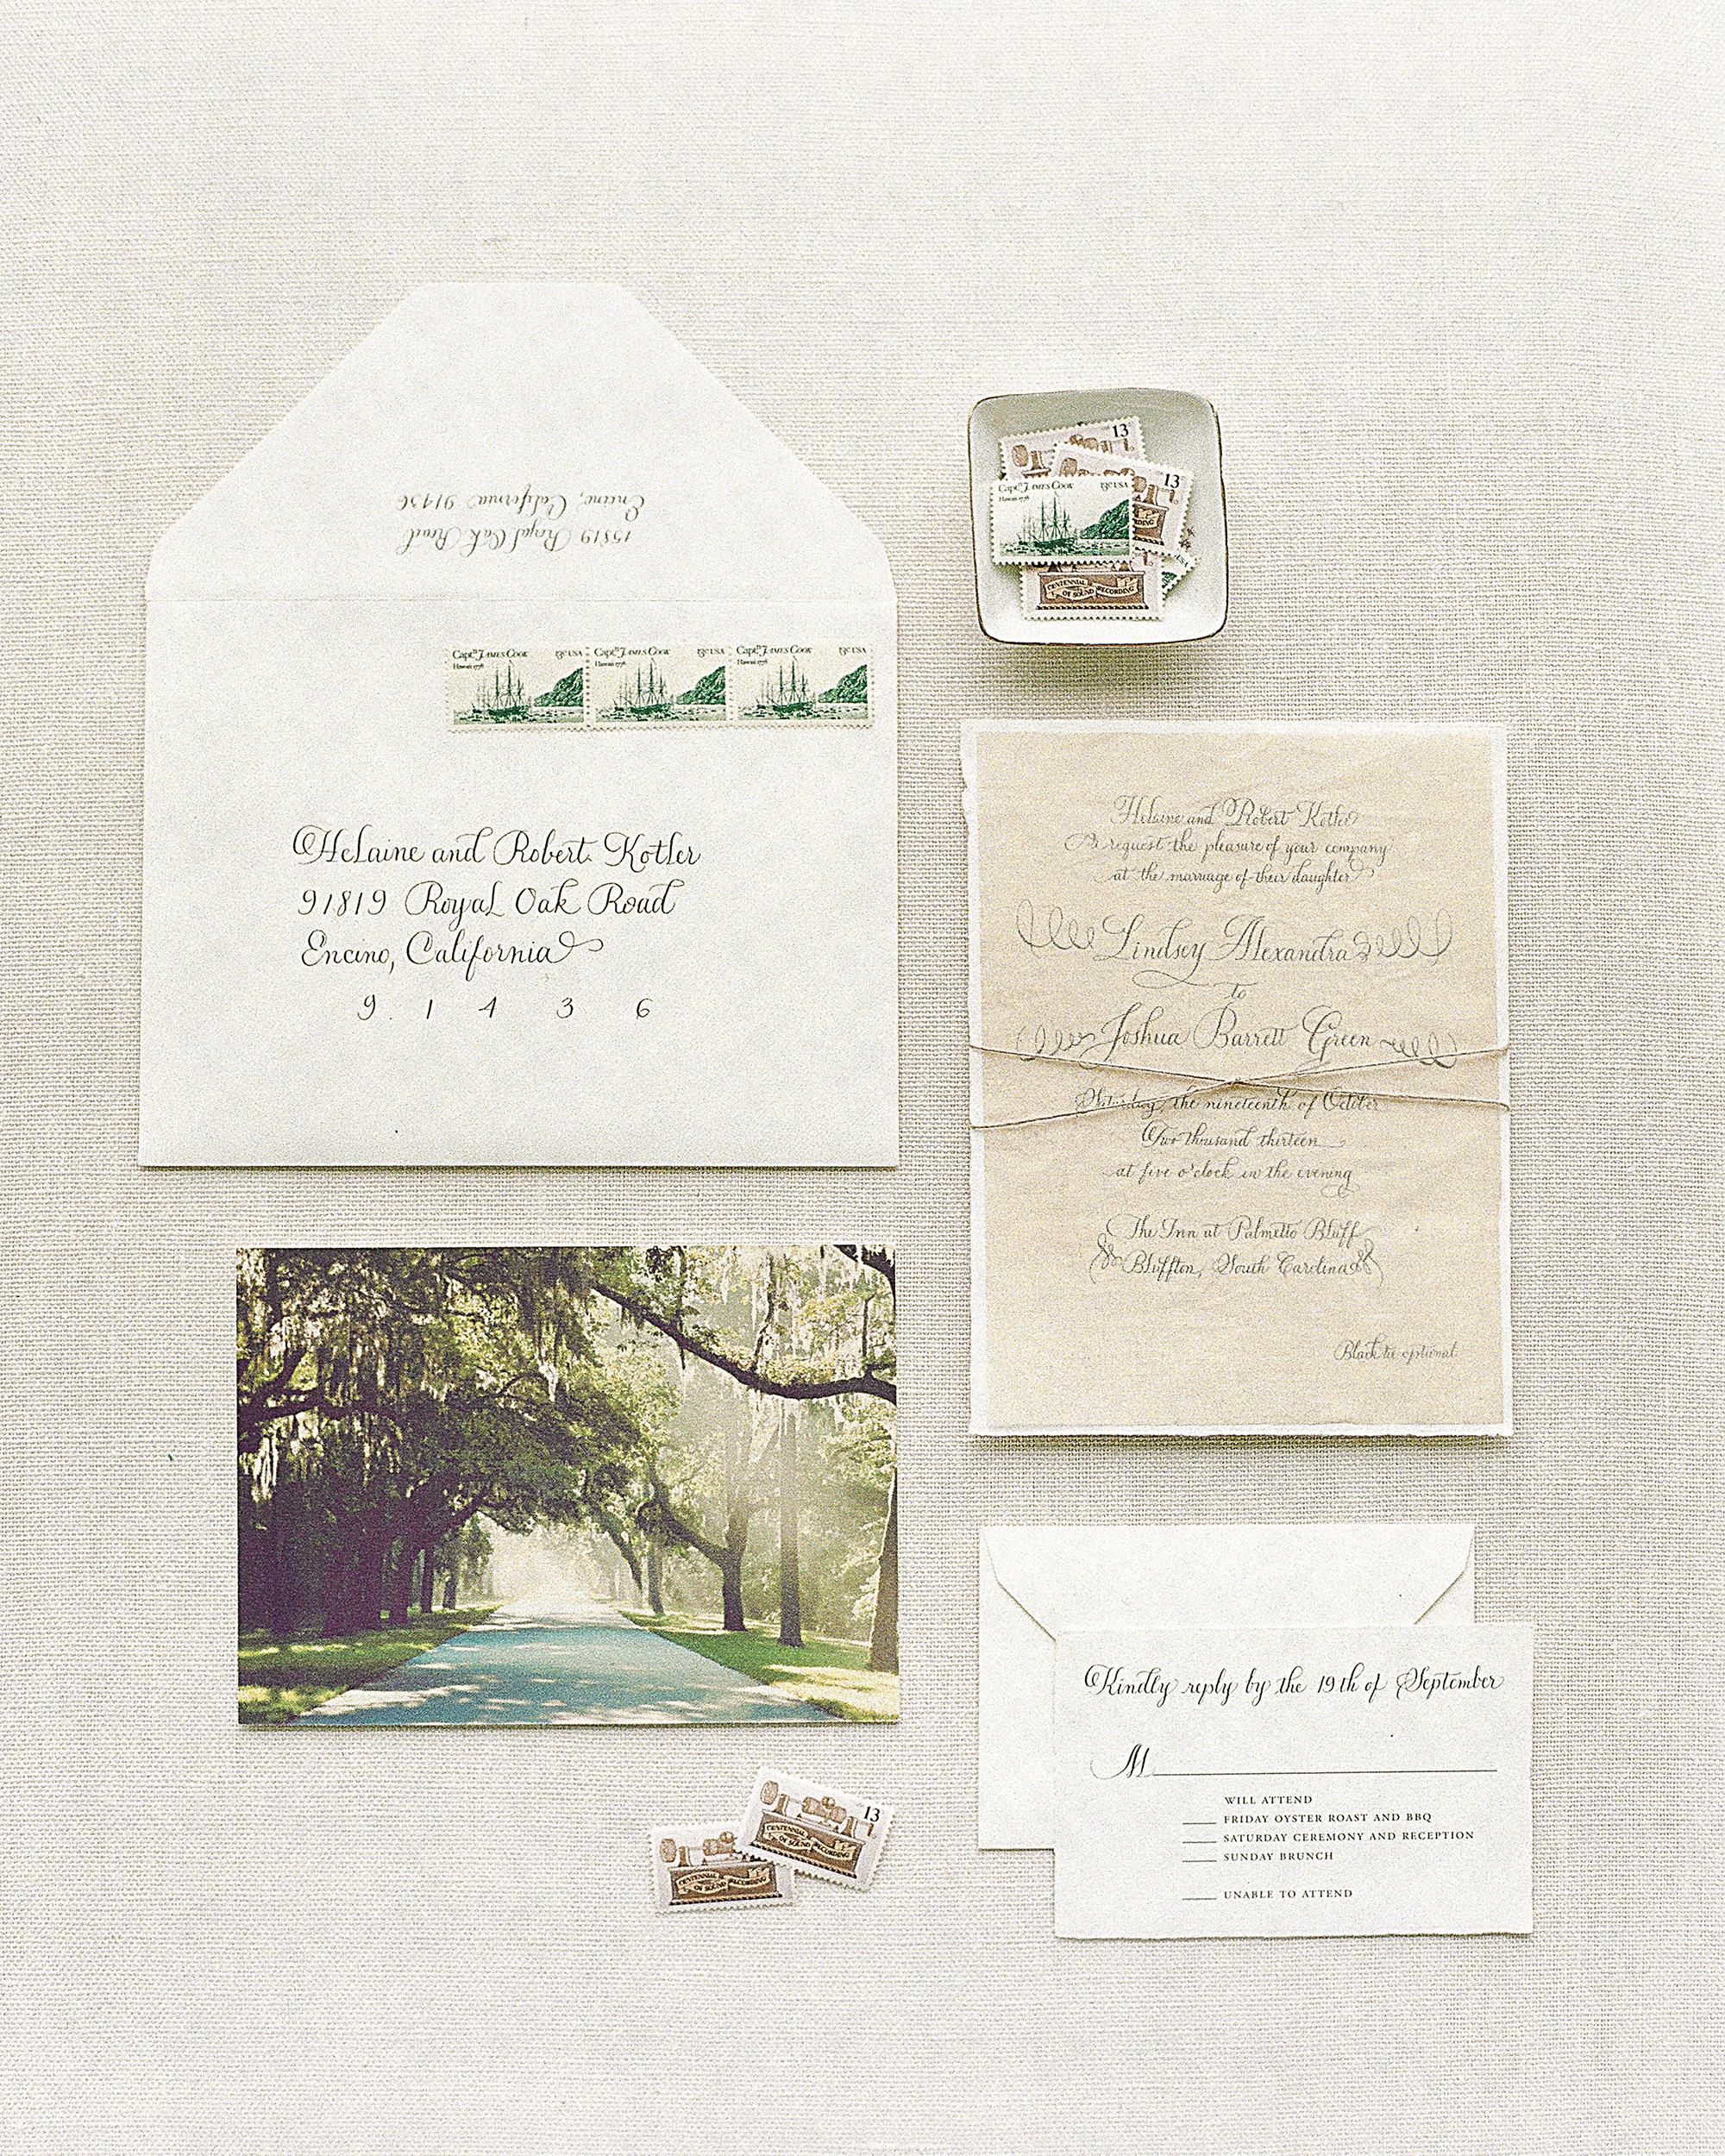 stationary-invitations-2013-lindsey-josh-0263-mwds110860.jpg